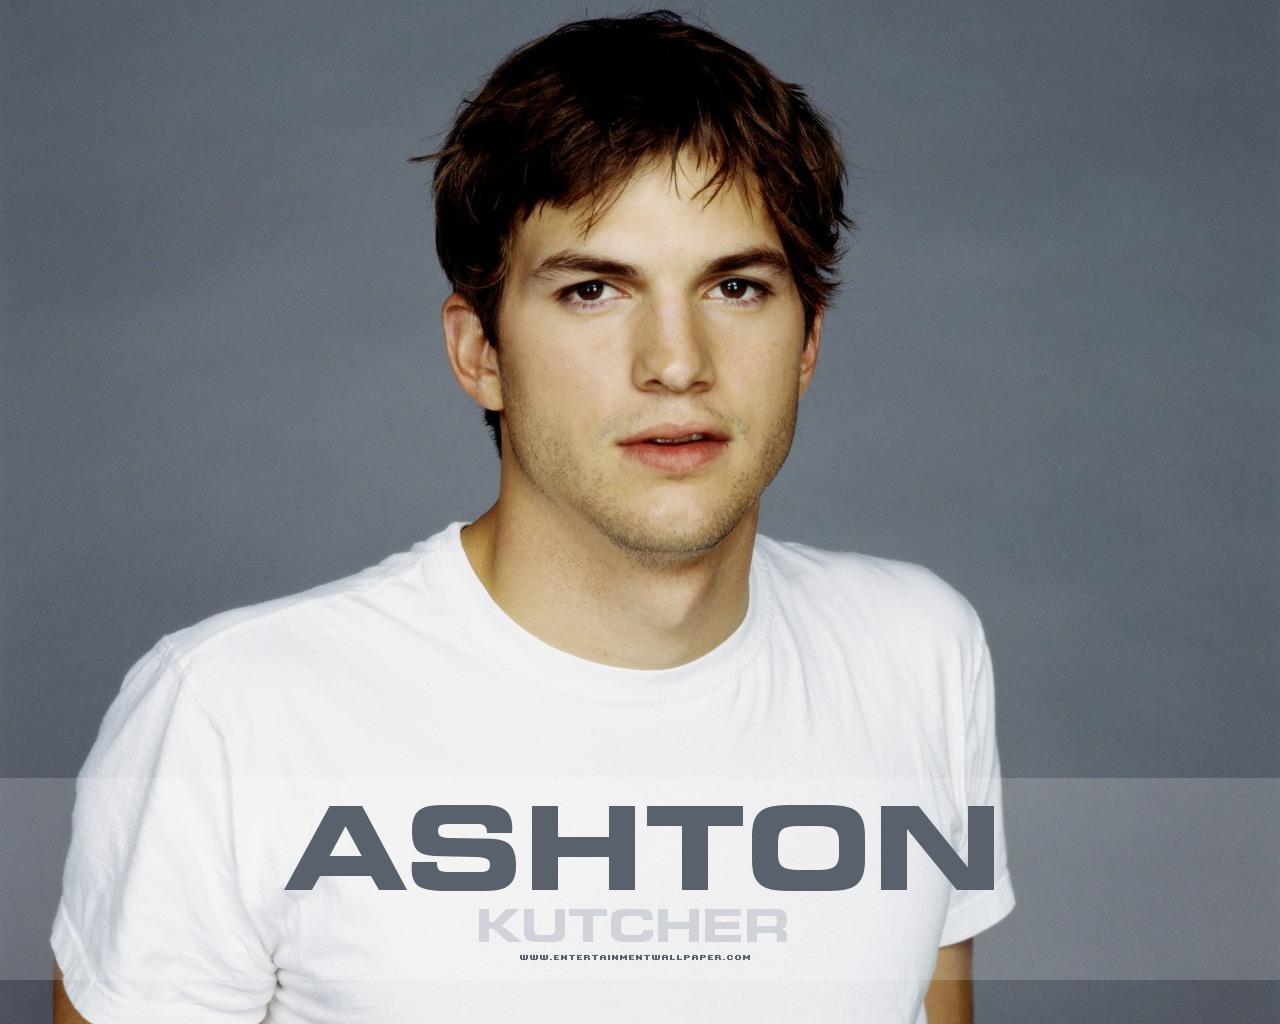 Ashton kutcher,wallpapers,actor